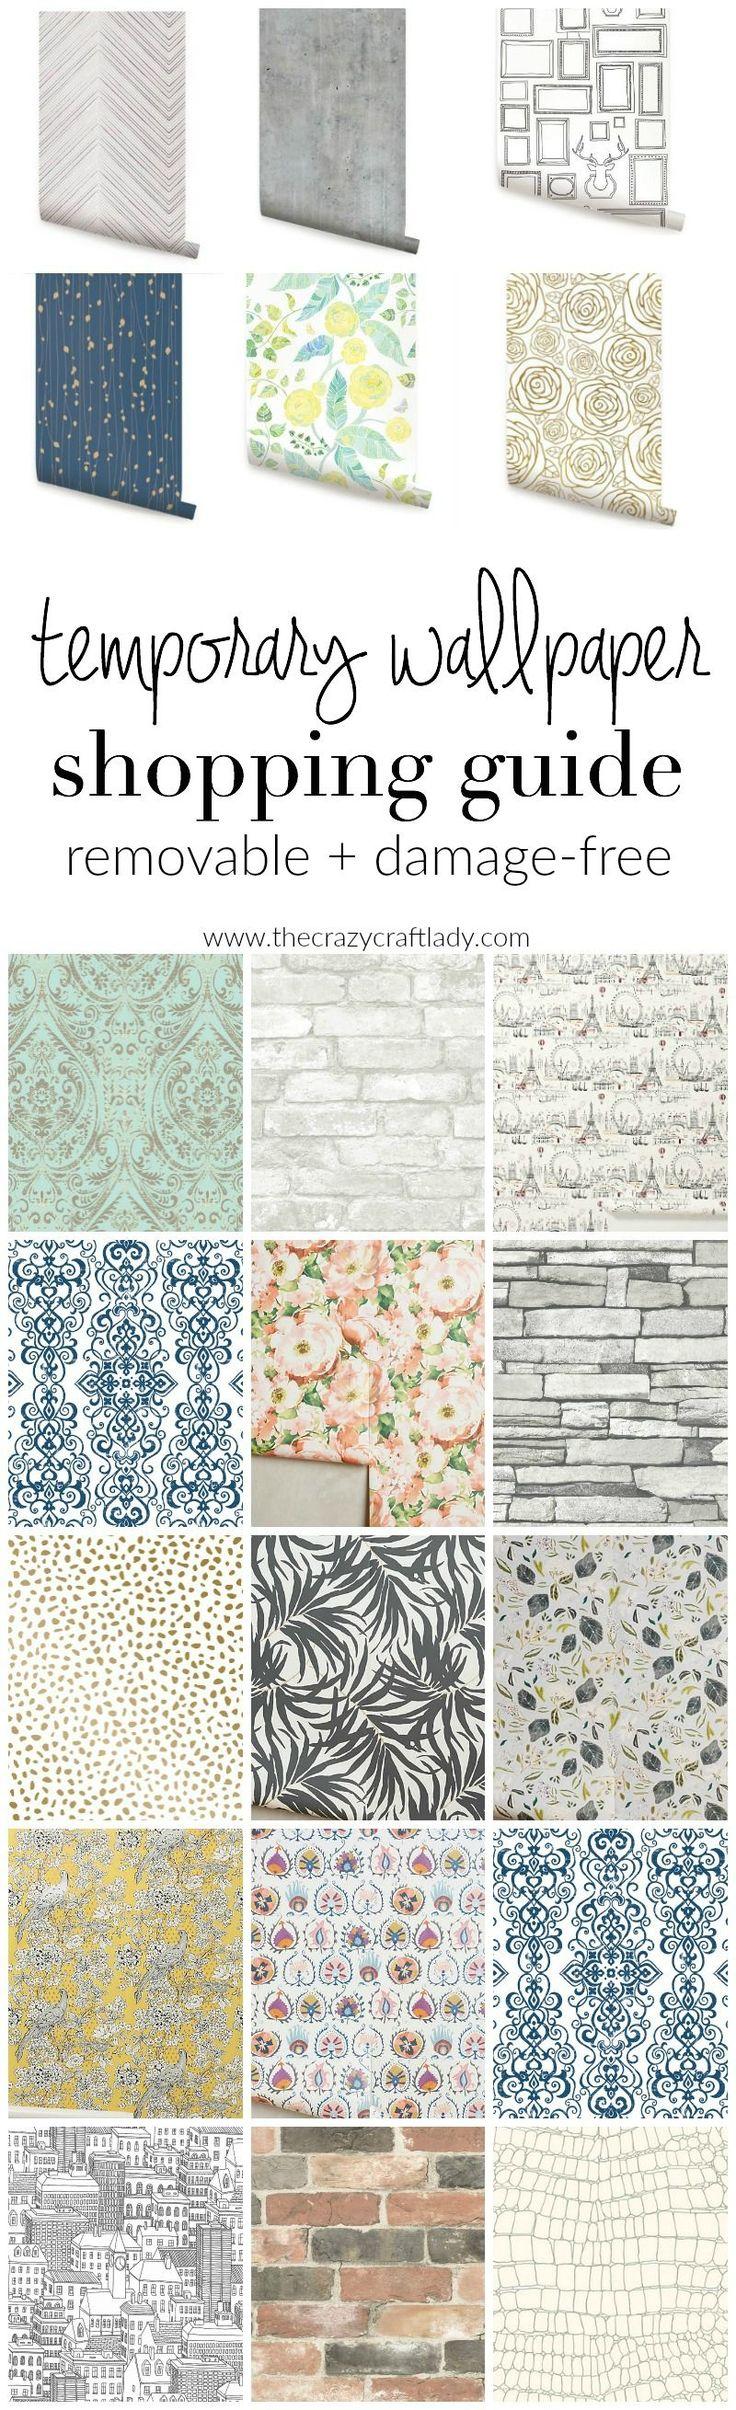 best 25+ peelable wallpaper ideas on pinterest | wallpaper ideas